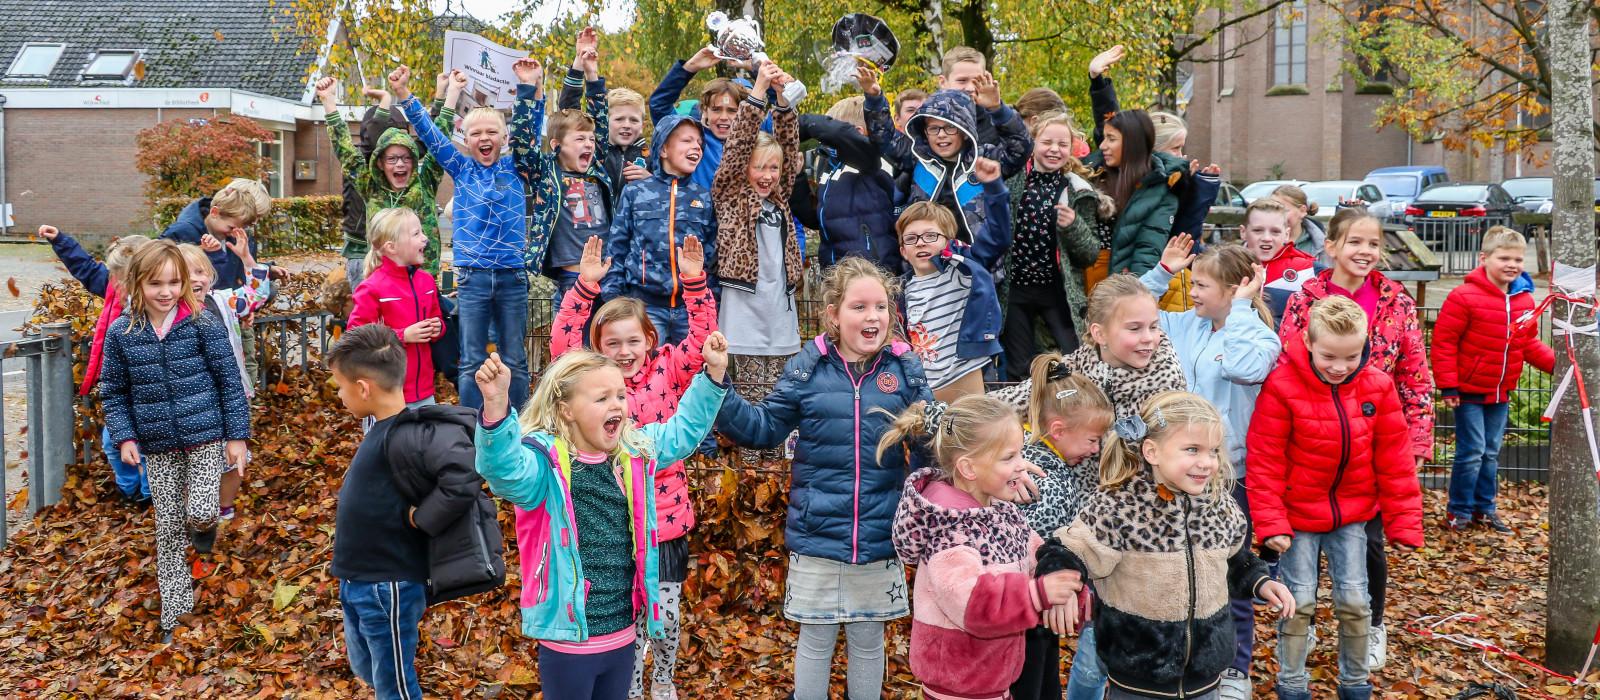 Sancta Maria en Hovenschool winnen Bladverzamelwedstrijd 2020